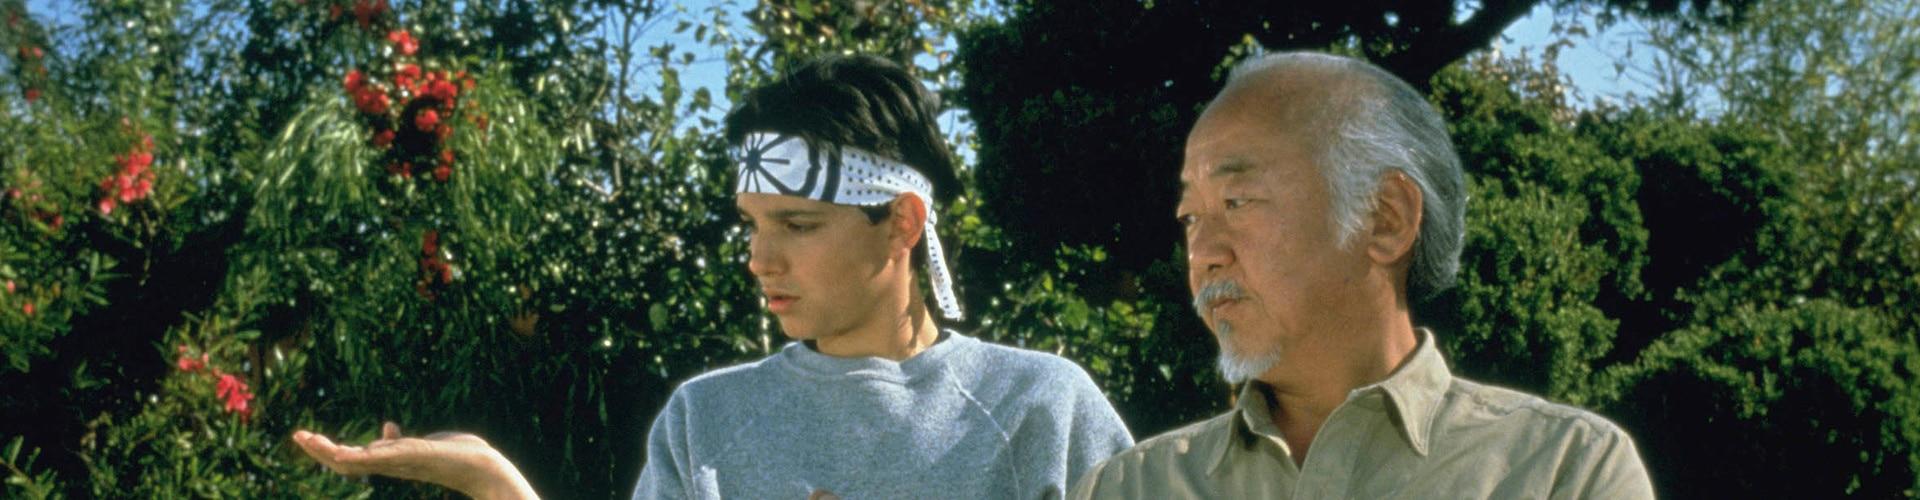 Watch The Karate Kid Part III Online